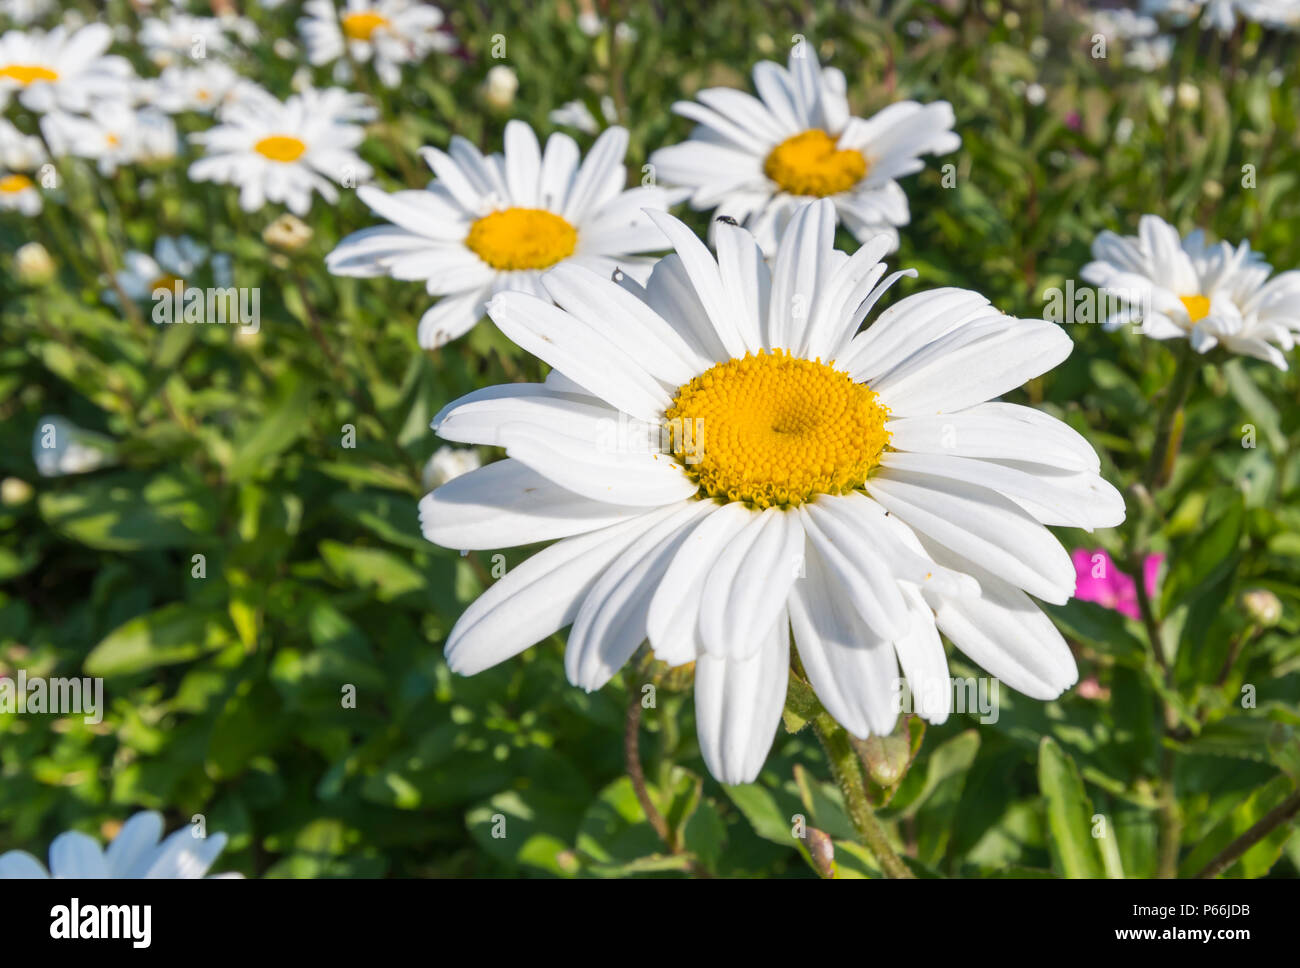 Daisy like flower stock photos daisy like flower stock images alamy leucanthemum x superbum or shasta daisies large daisy like flower growing in summer in izmirmasajfo